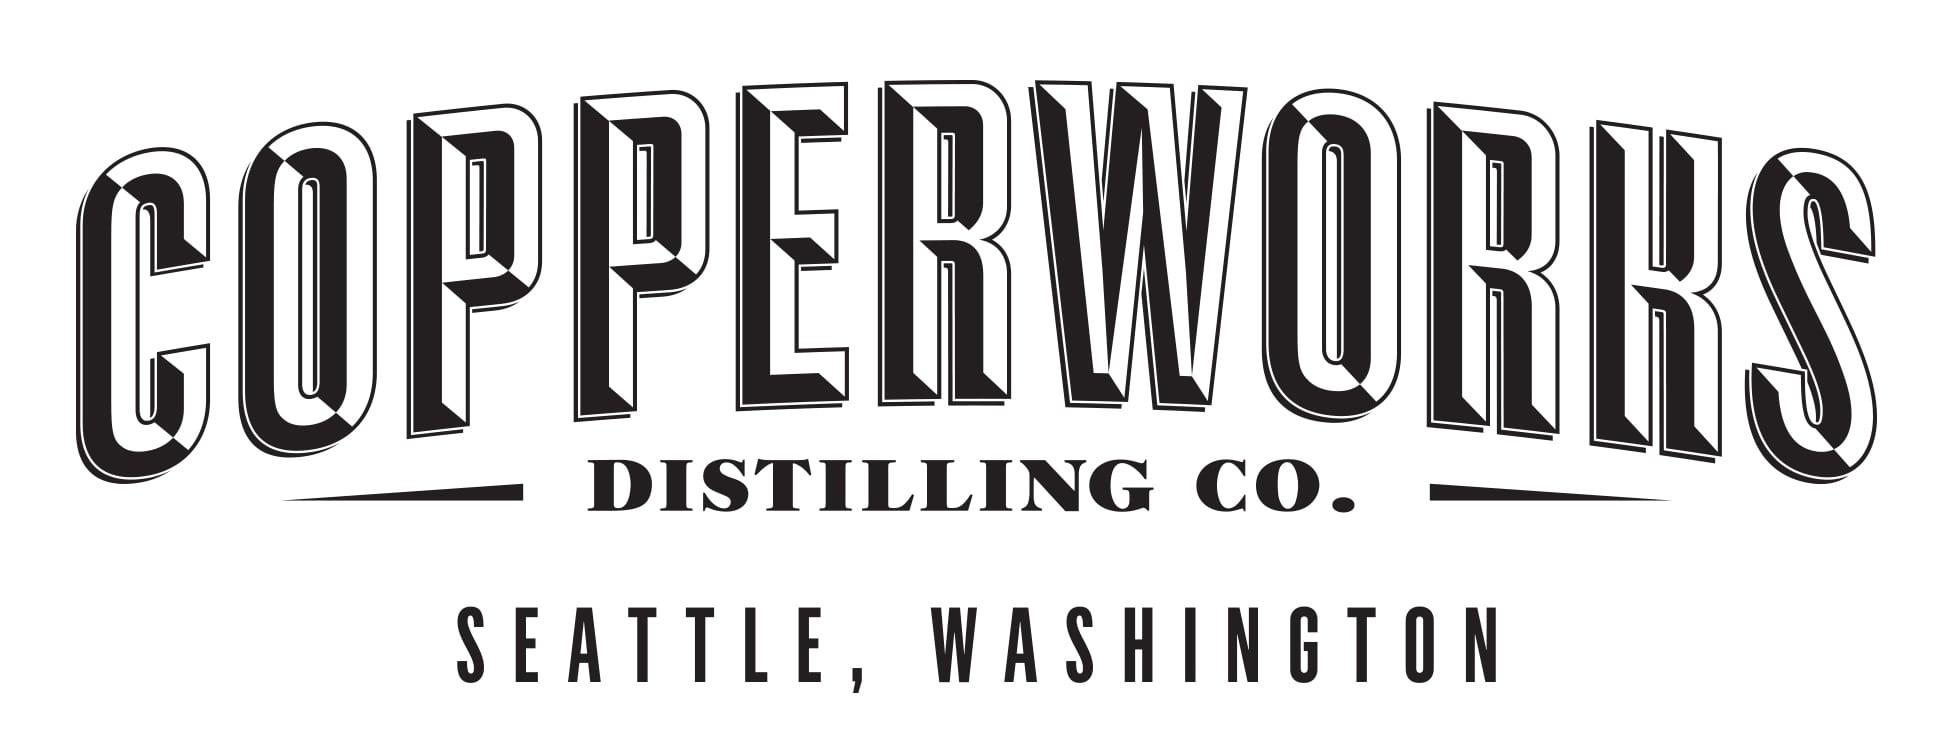 Copperworks_Vertical_Logo_Seattle1.jpg